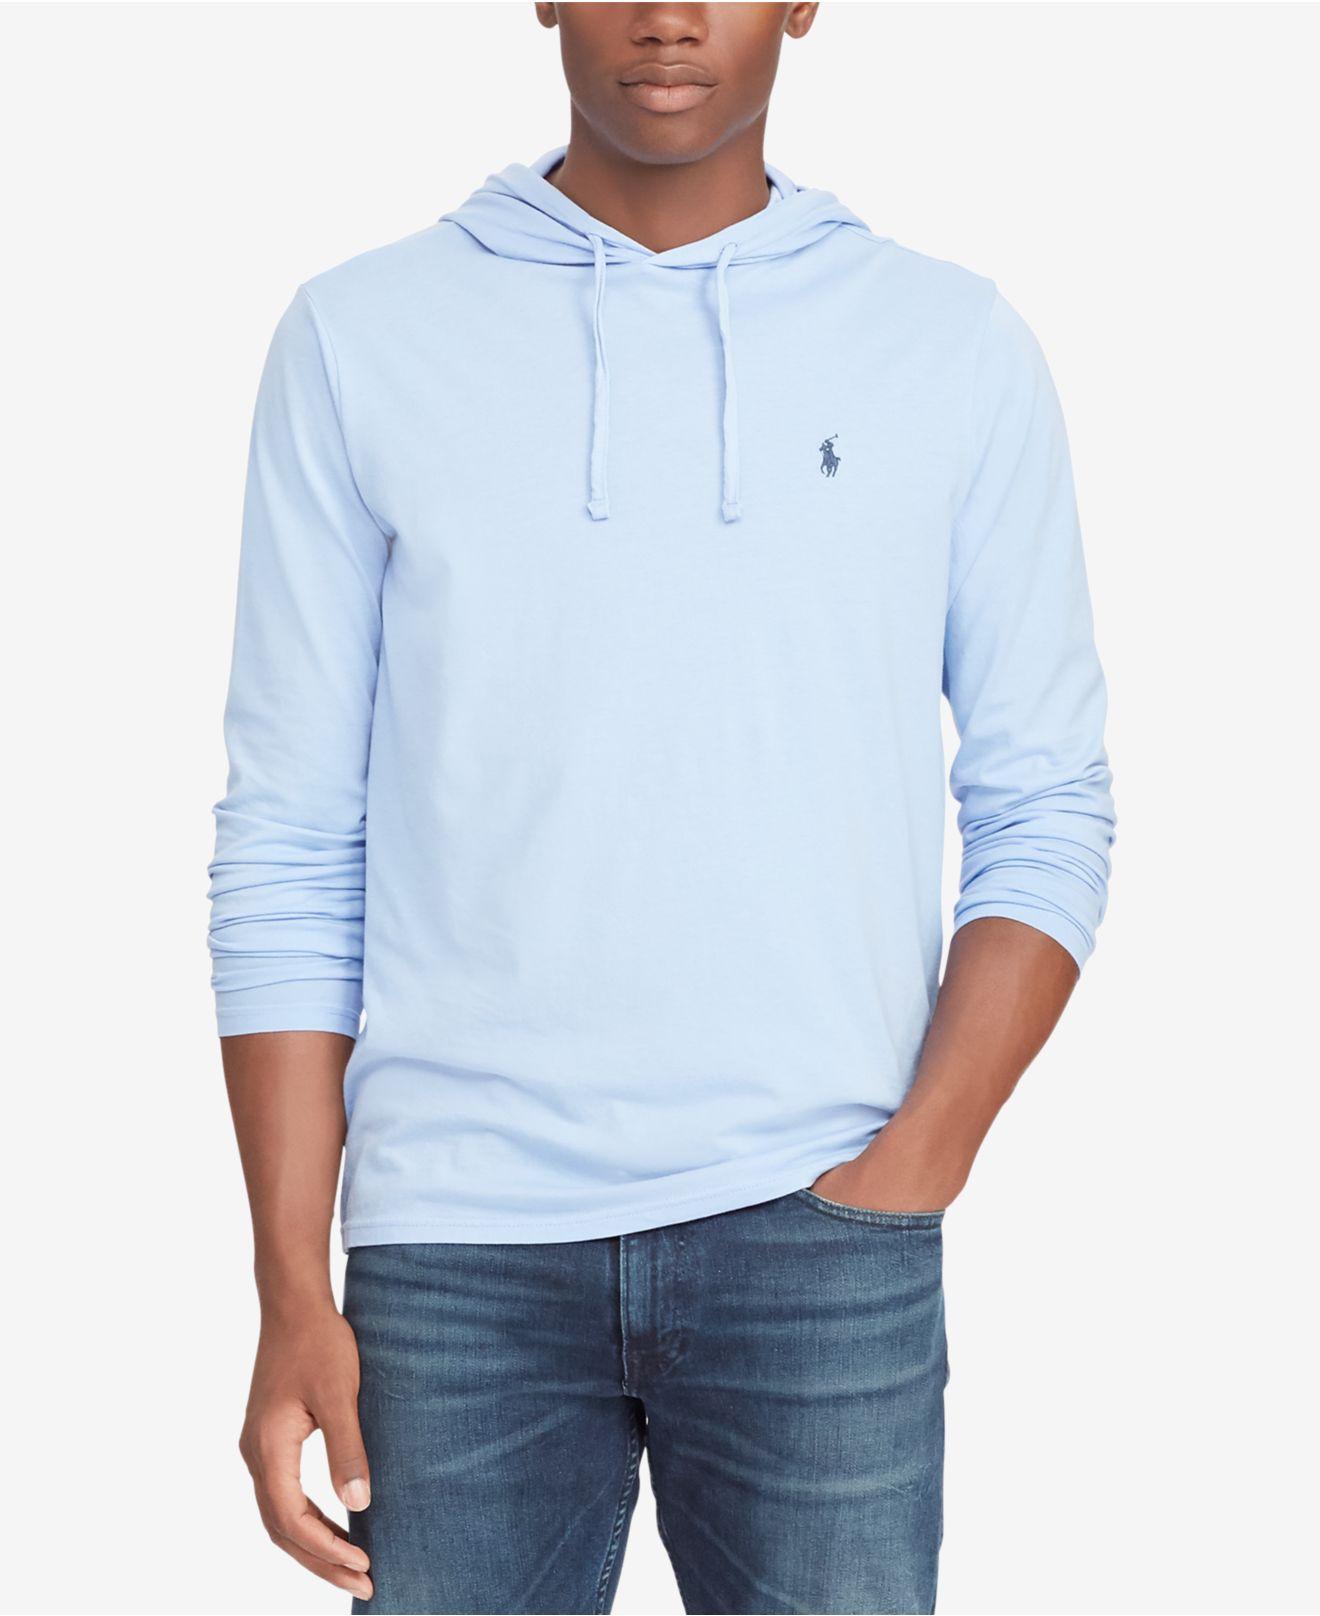 304239672 Lyst - Polo Ralph Lauren Jersey T-shirt Hoodie in Blue for Men ...